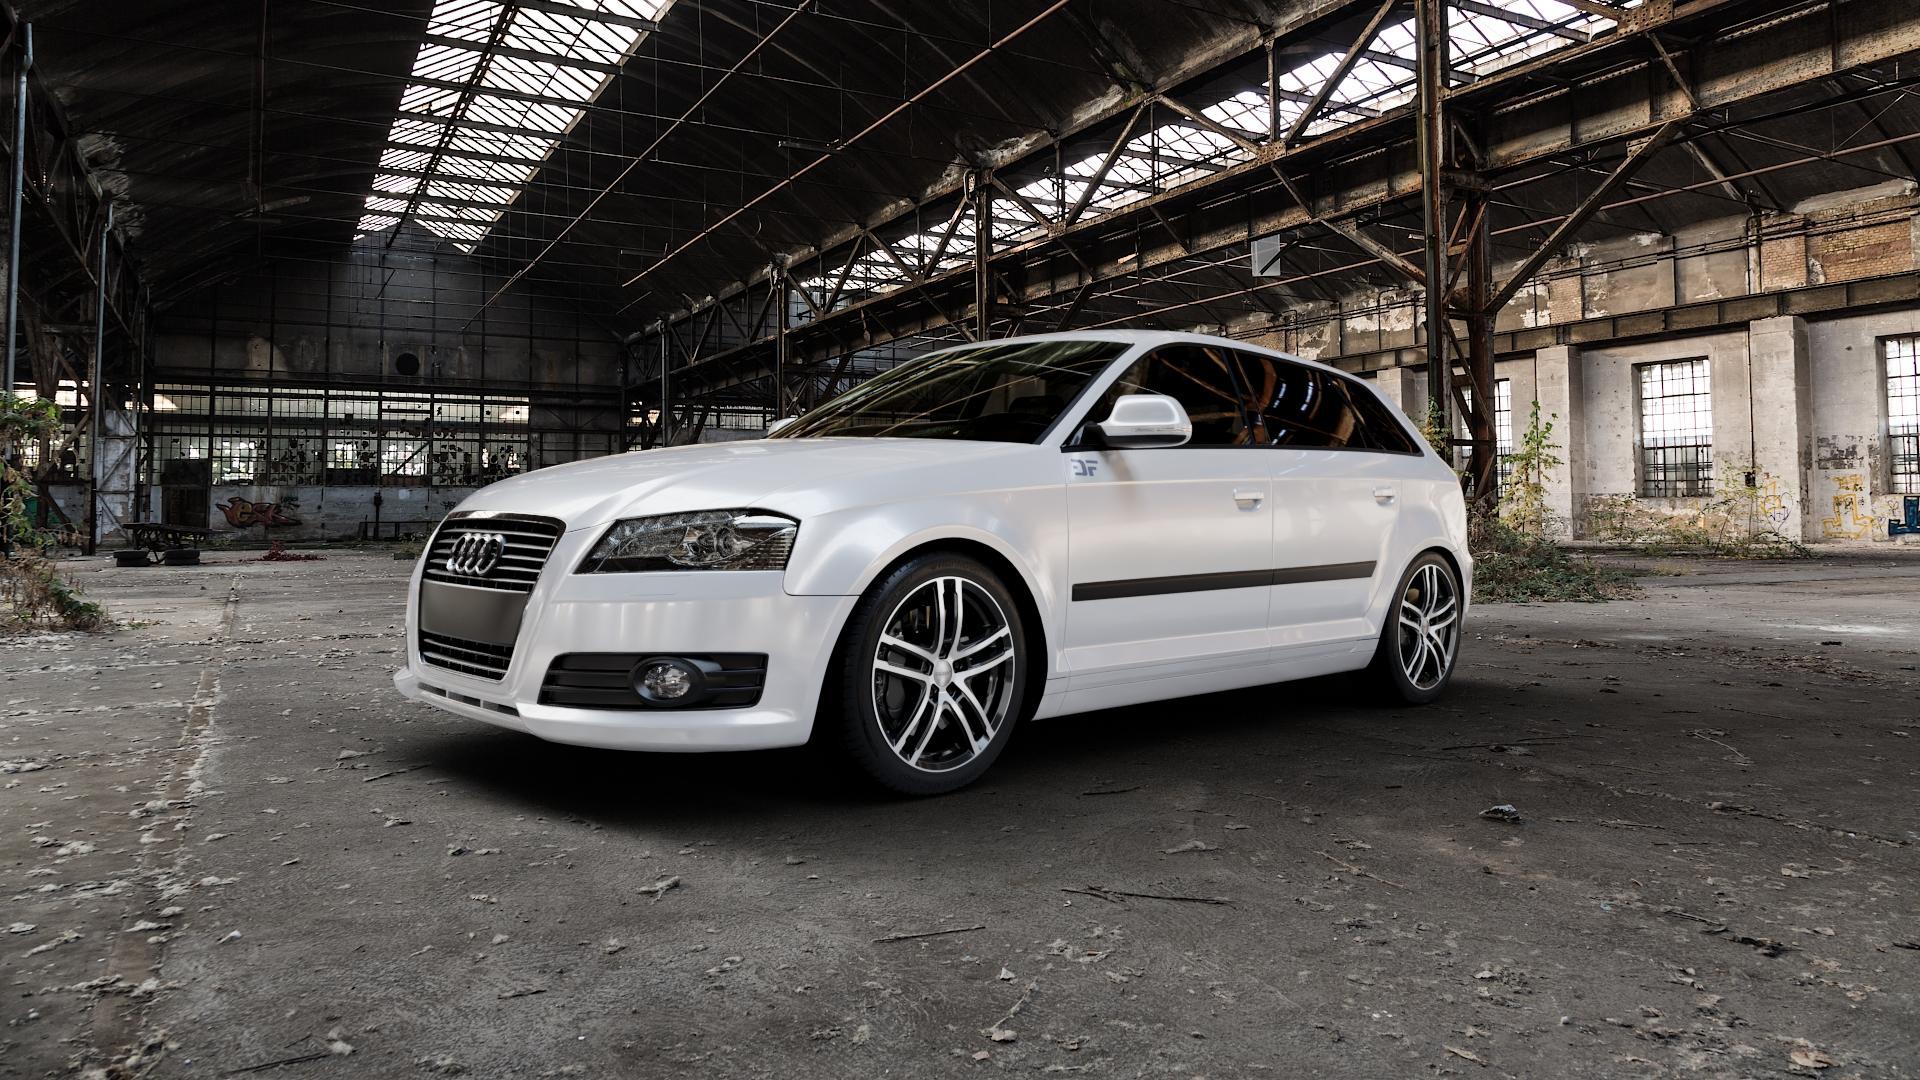 DEZENT TZ BLACK/POLISHED FRONT Felge mit Reifen silber schwarz mehrfarbig in 17Zoll Alufelge auf weissem Audi A3 Typ 8P (Sportback) 1,6l 75kW (102 PS) 2,0l FSI 110kW (150 1,9l TDI 77kW (105 103kW (140 TFSI 147kW (200 85kW (116 100kW (136 1,8l 118kW (160 125kW (170 1,4l 92kW (125 120kW (163 quattro 3,2l V6 184kW (250 S3 195kW (265 1,2l 66kW (90 18